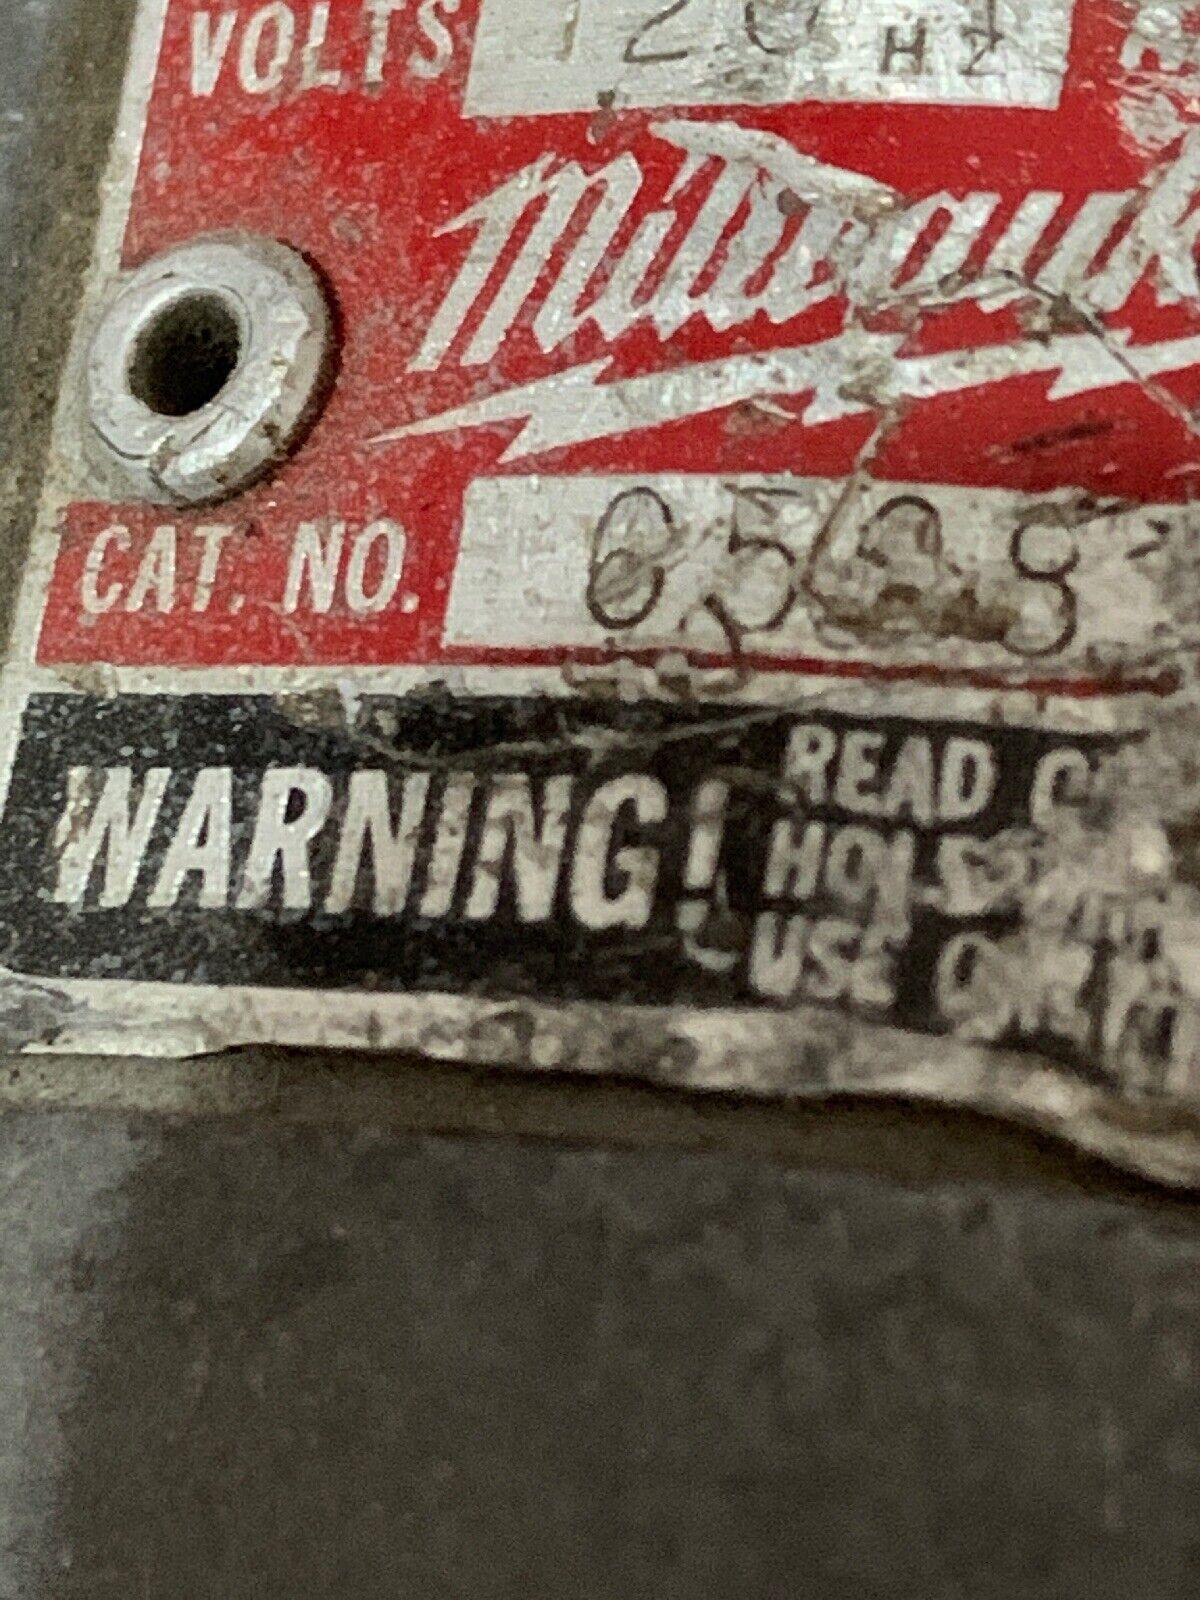 2 Milwaukee Sawzall 6508 6537  120V Reciprocating Saw - (s009